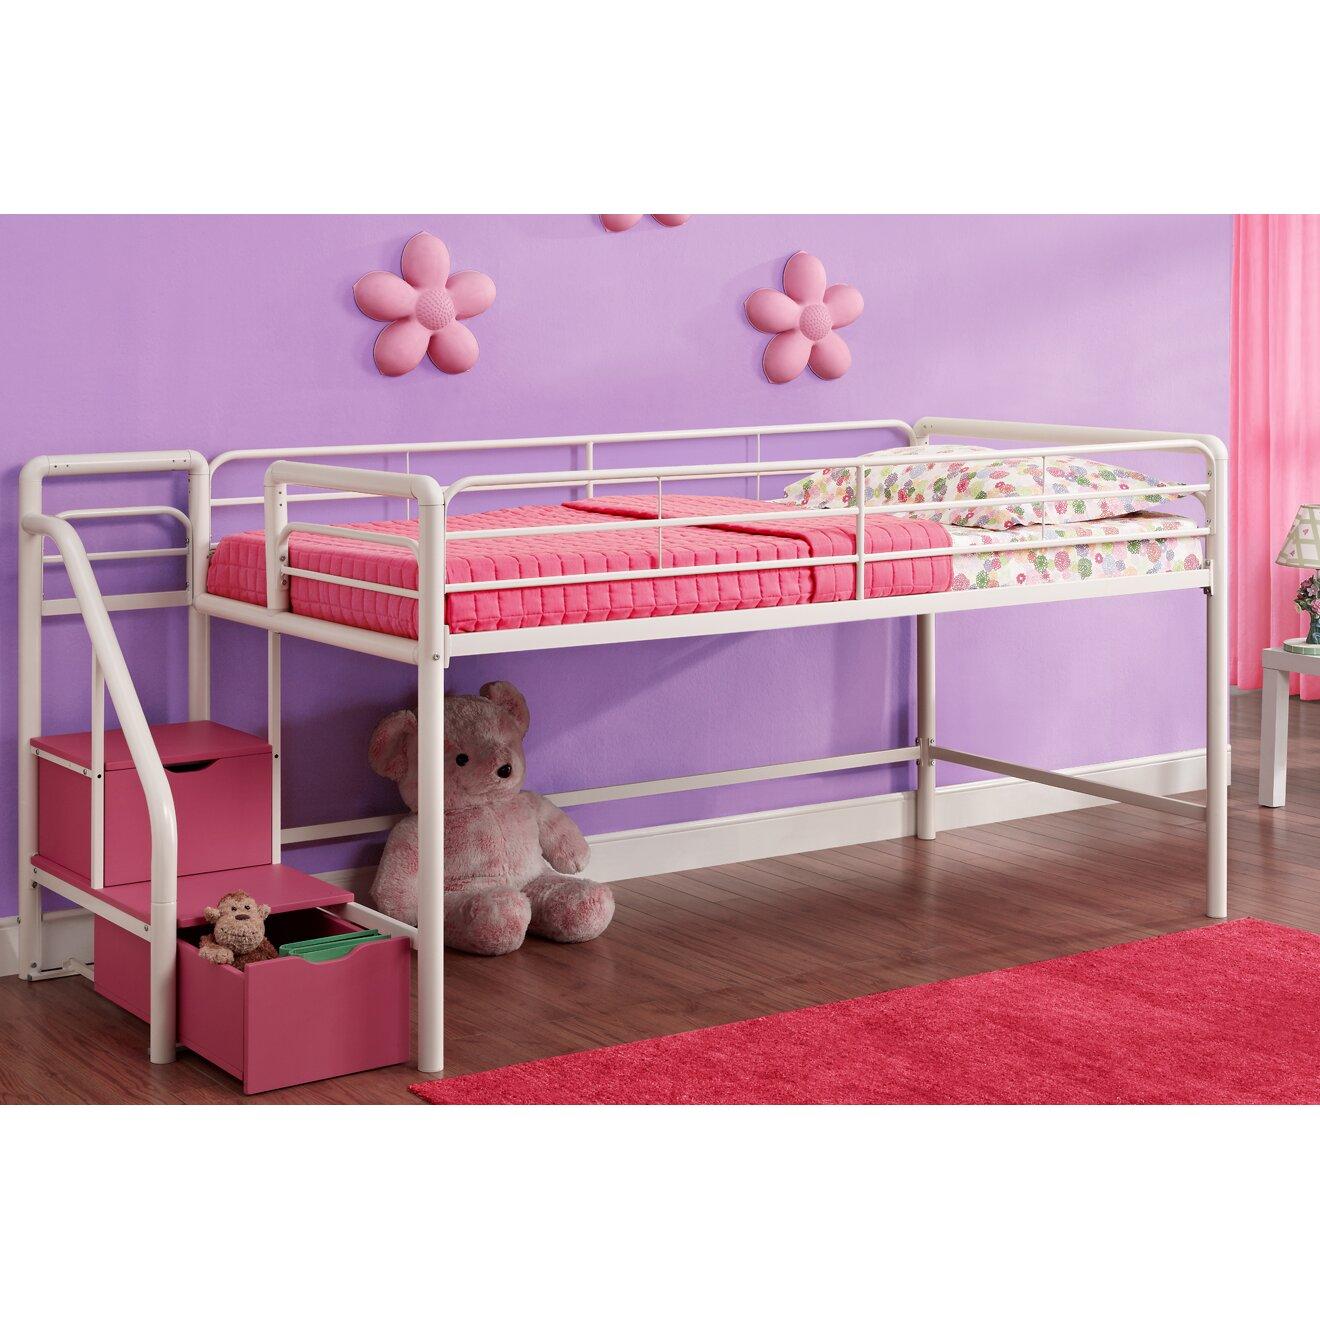 Dhp Twin Loft Bed